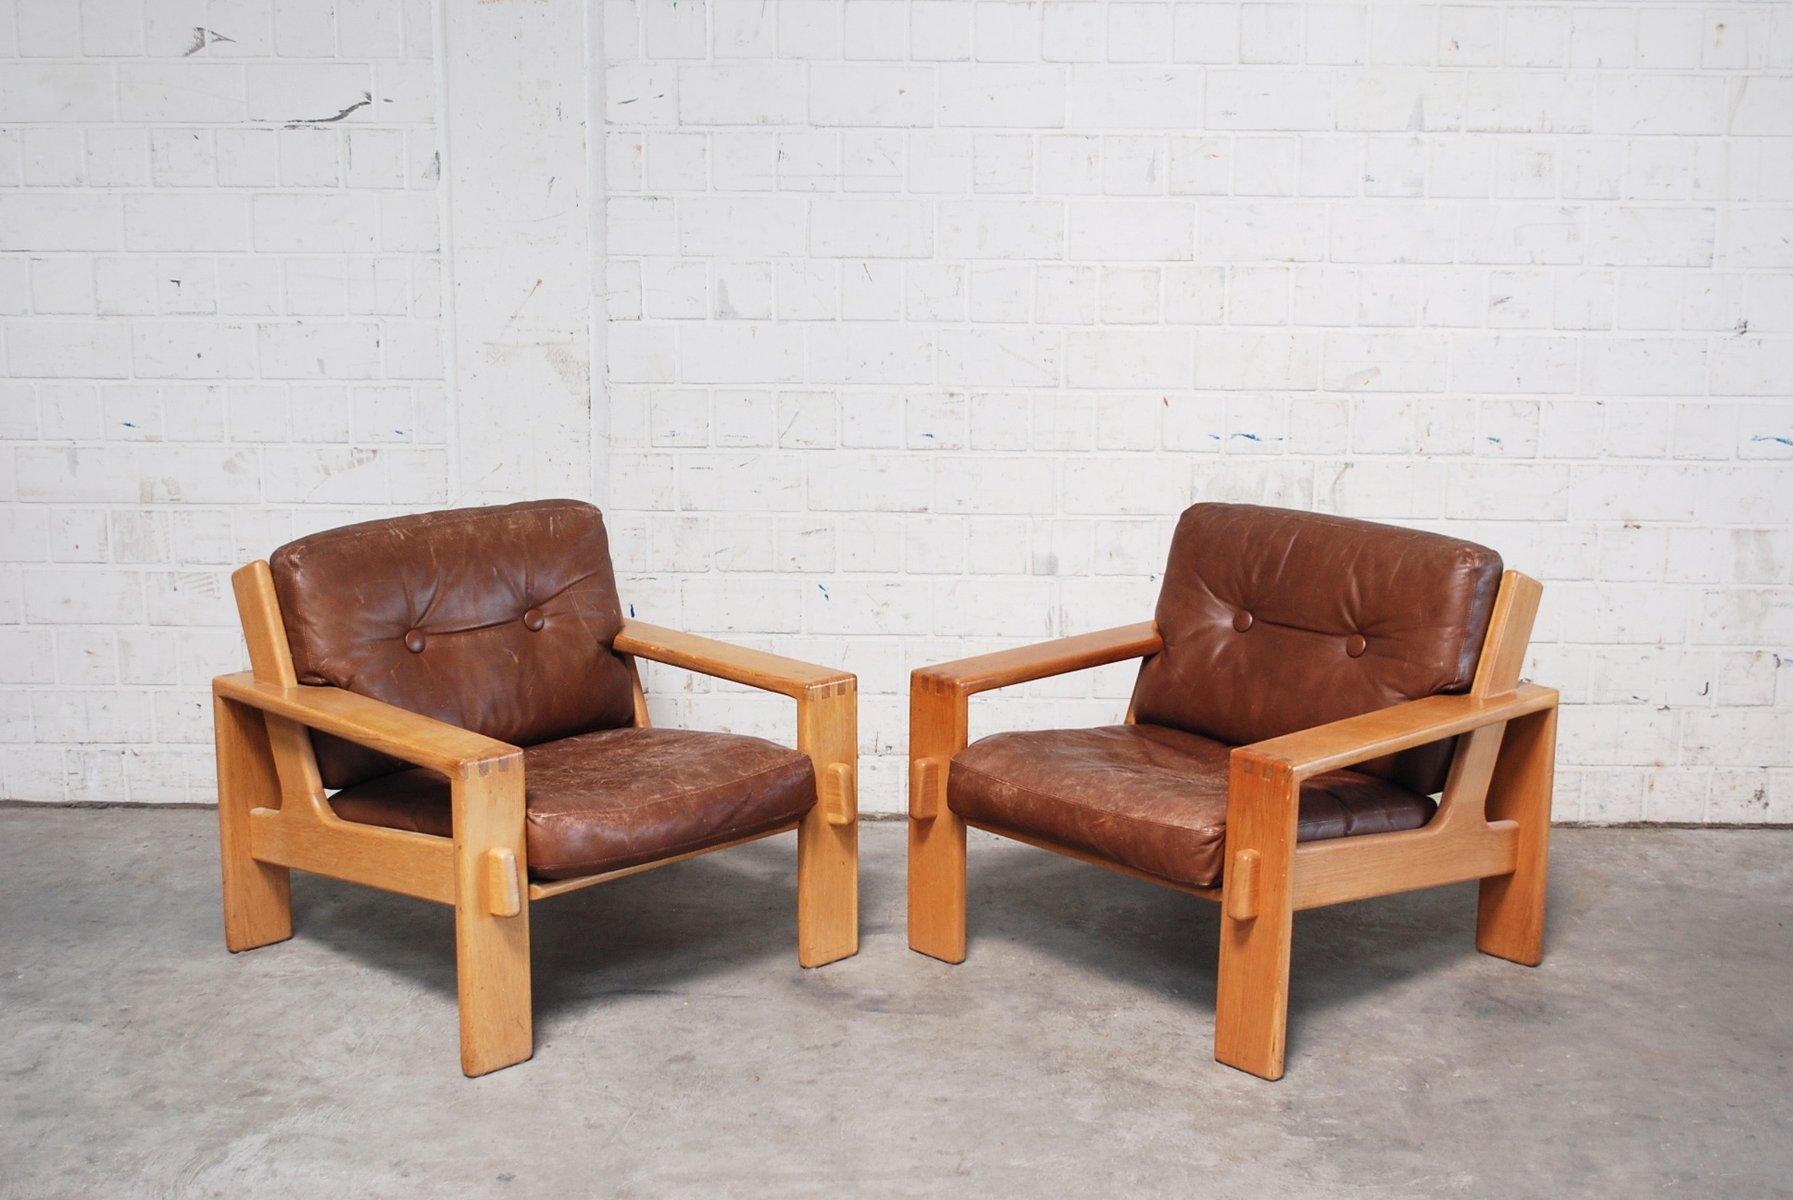 Delightful Vintage Bonanza Cognac Brown Leather Armchairs By Esko Pajamies For Asko,  Set Of 2